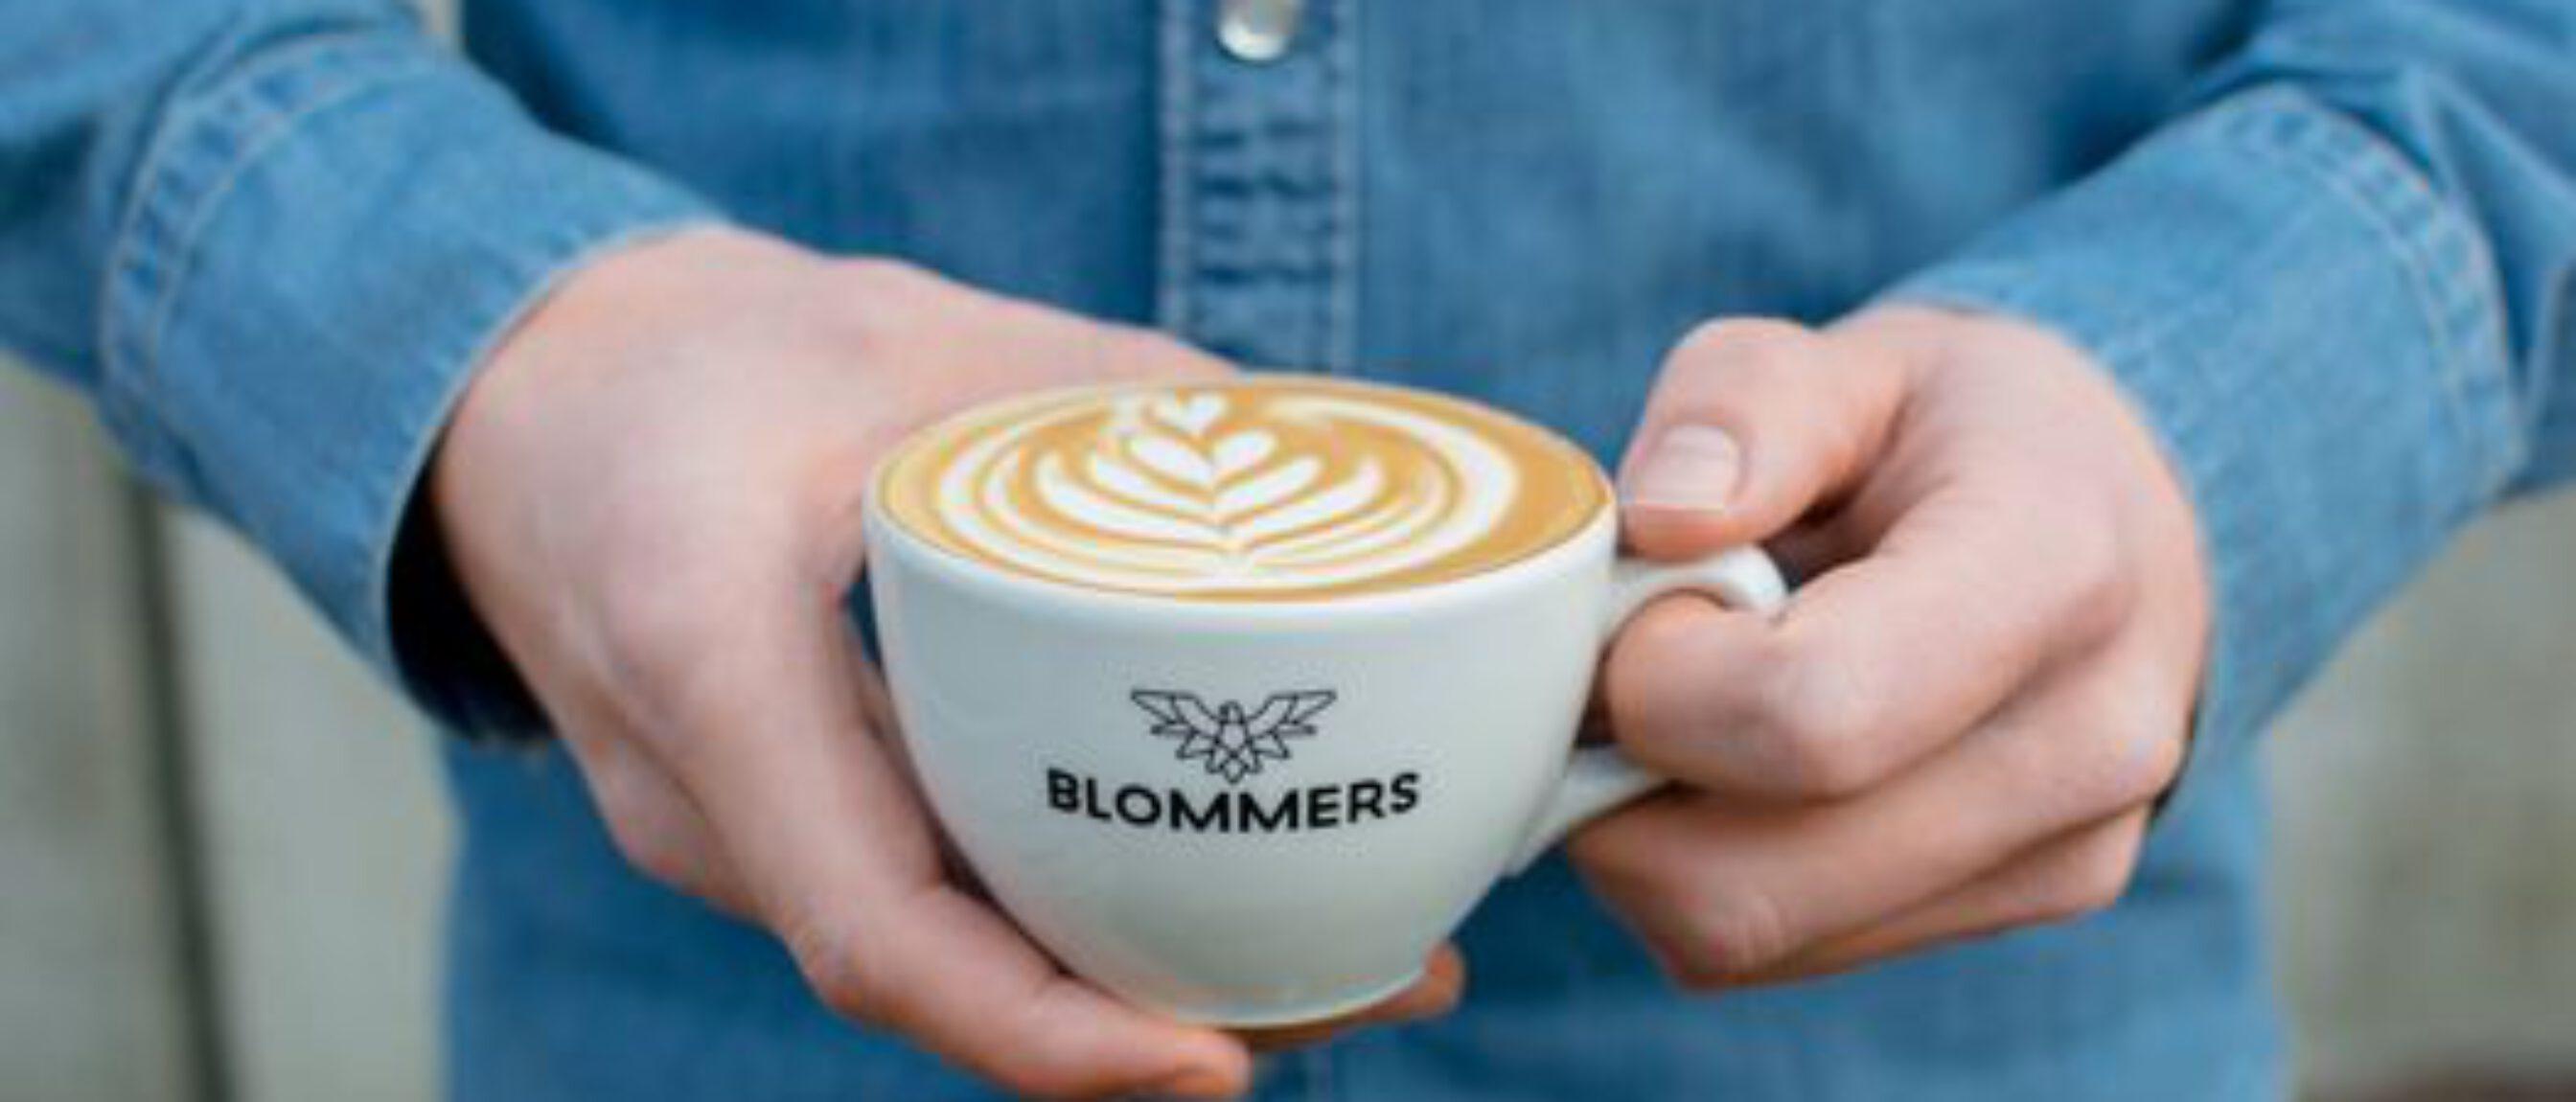 Blommers Coffee